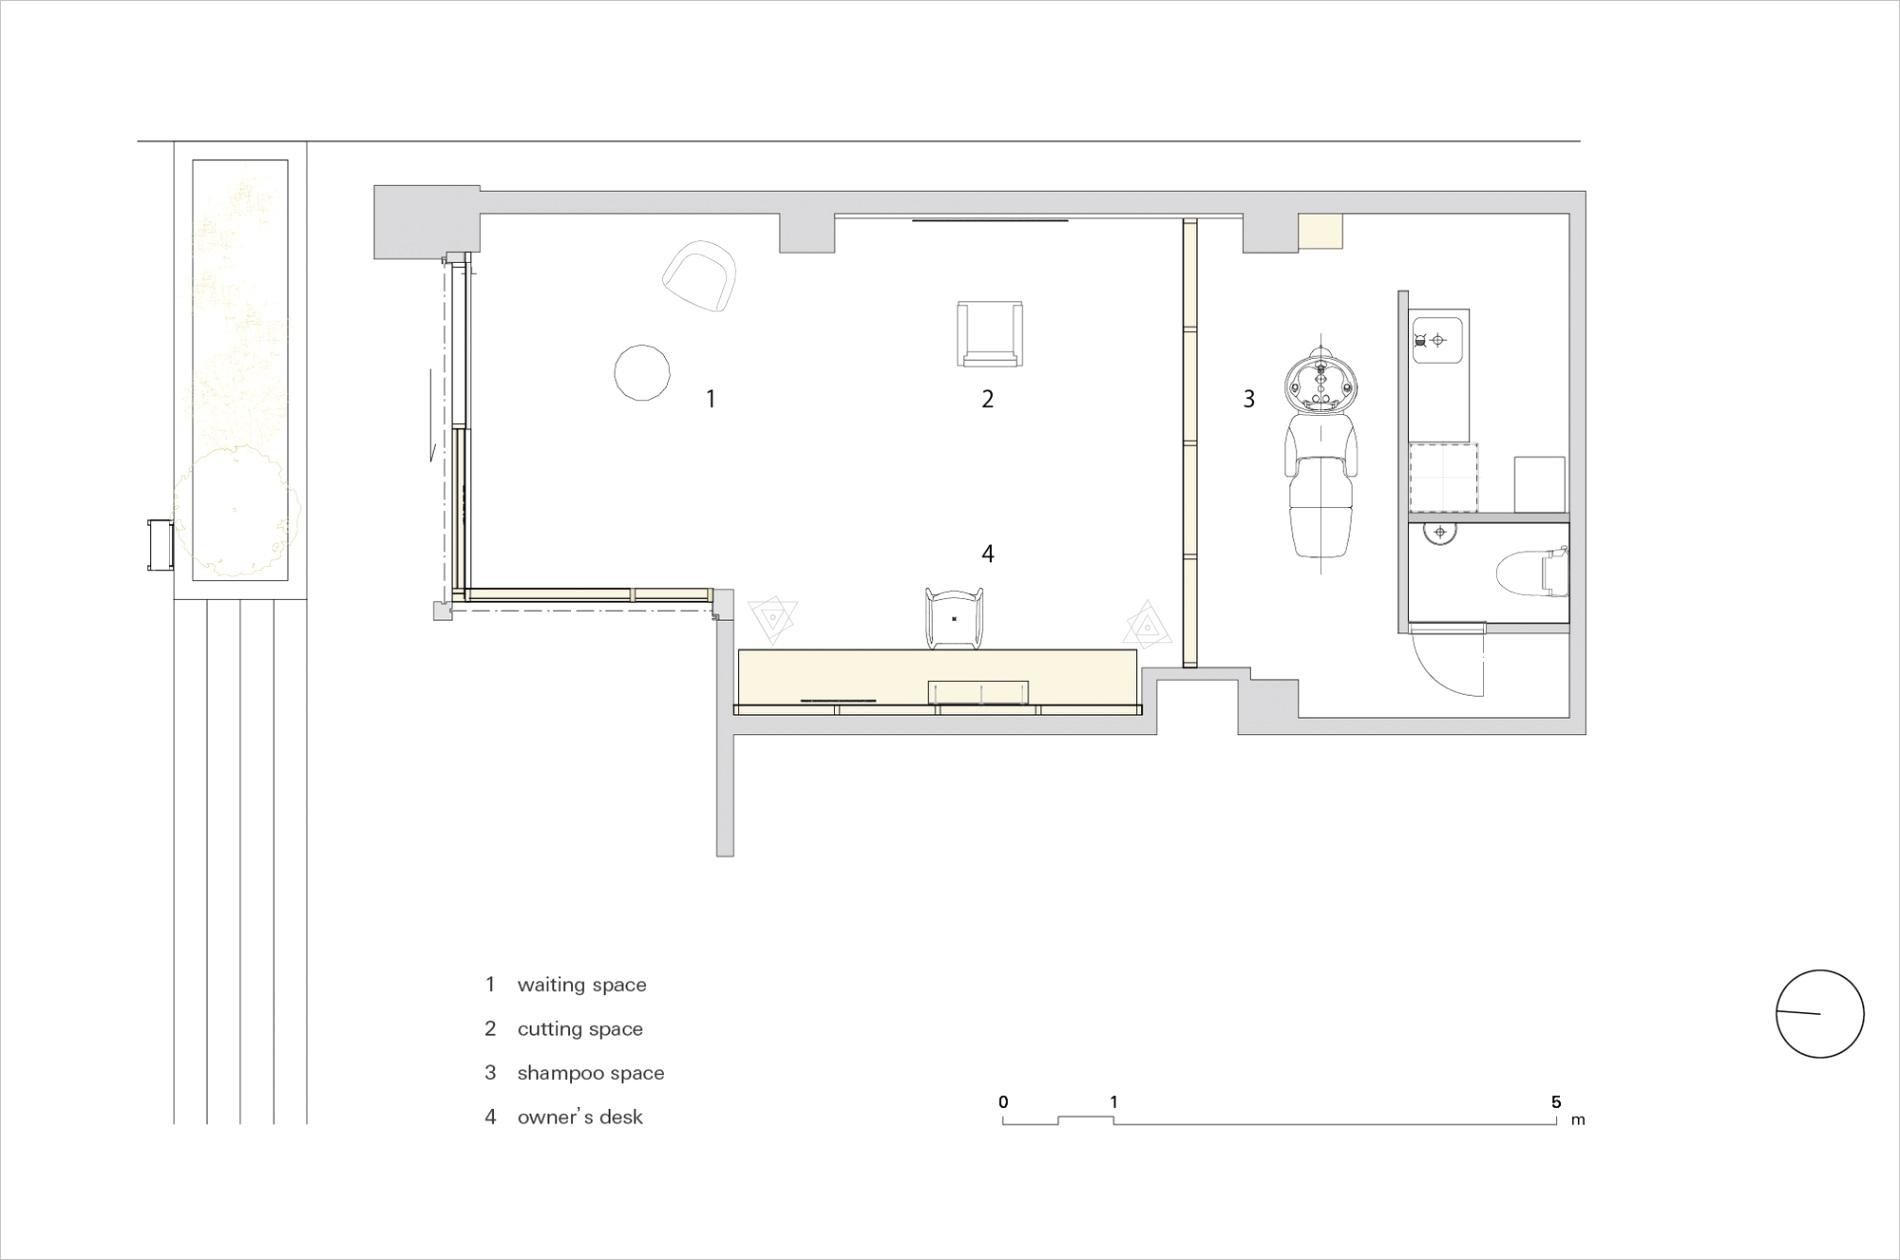 5664ec41e58ece70b equip hair salon sides core floor plan